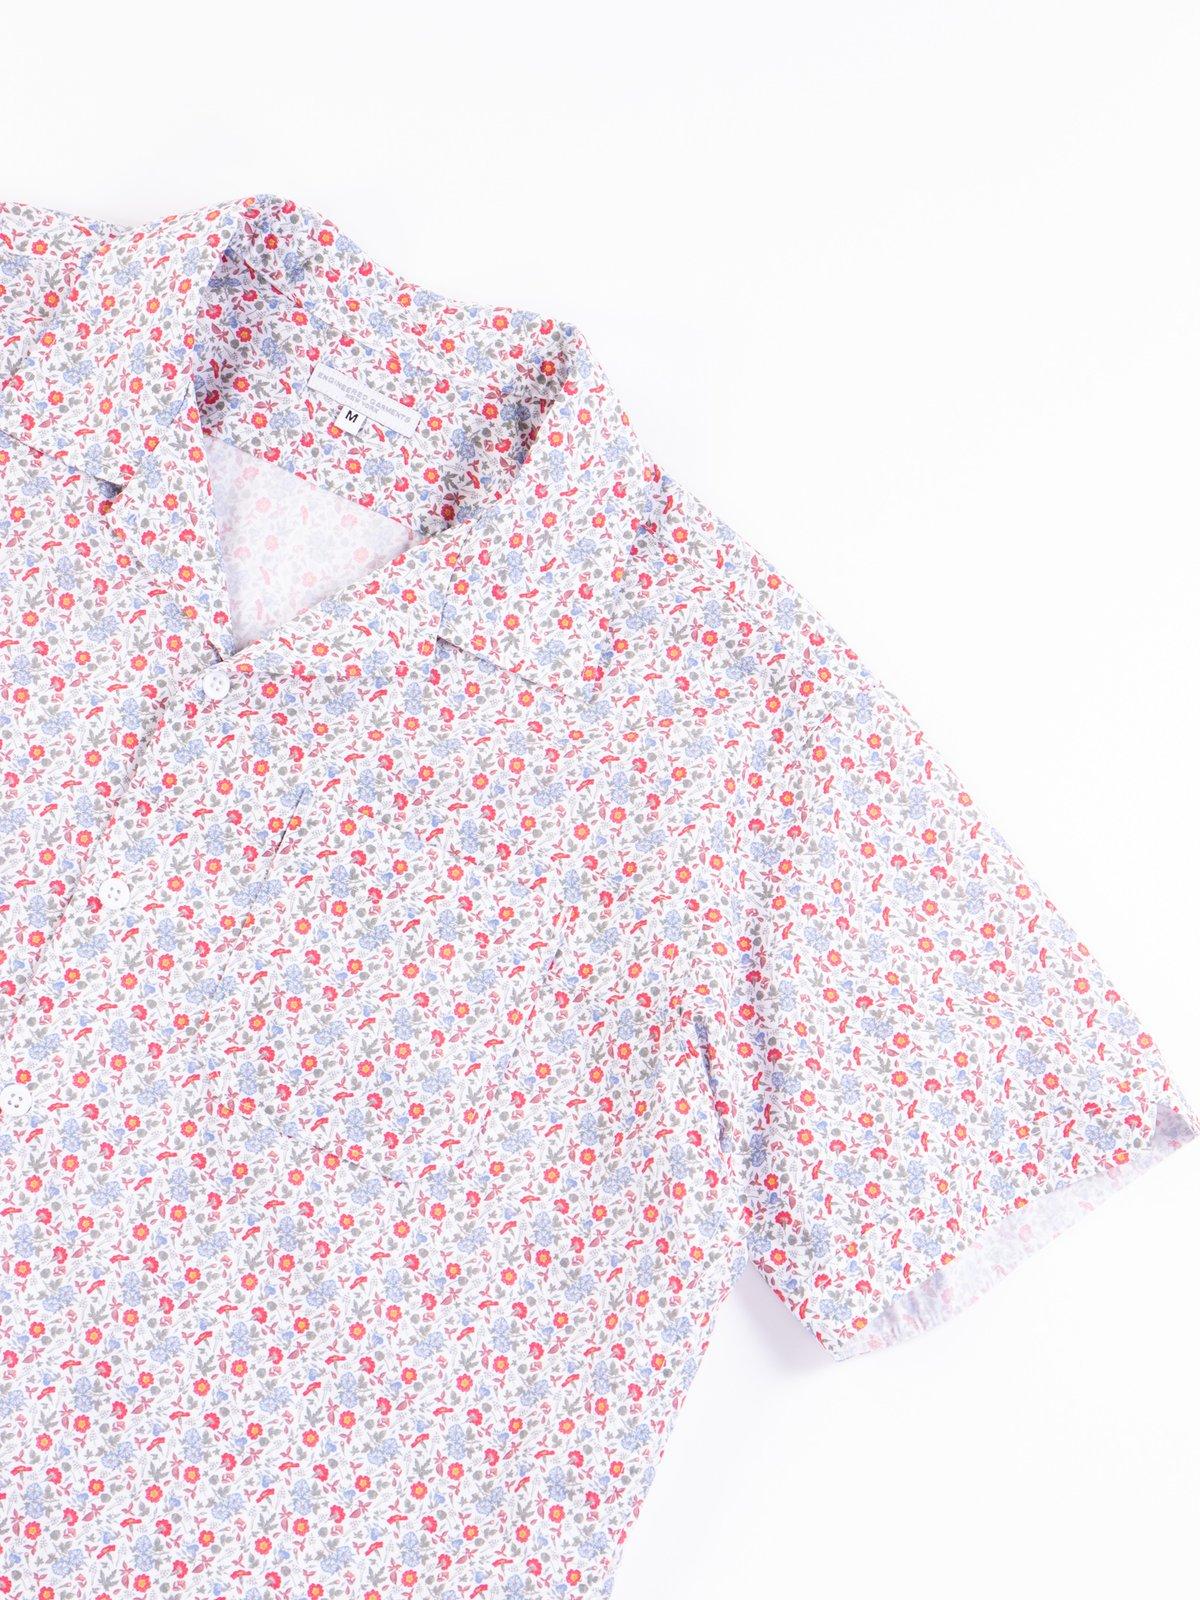 White/Blue/Orange Small Floral Camp Shirt - Image 4